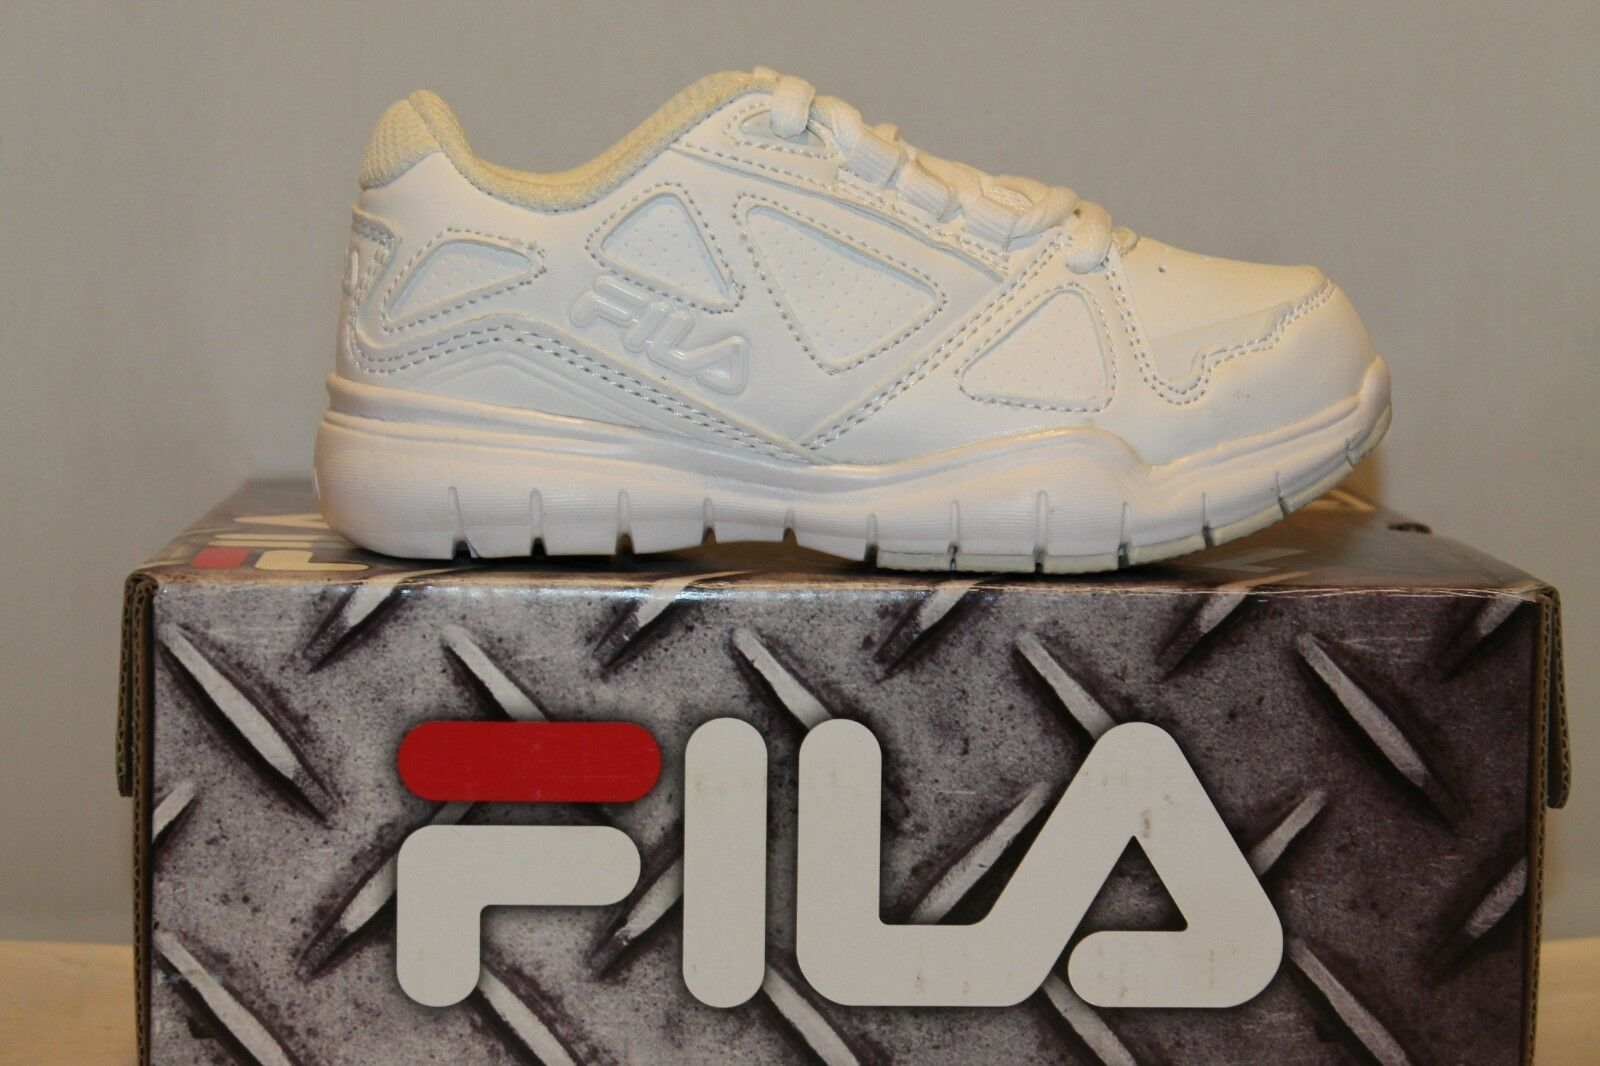 dc7da6491f67 Boys Girls Fila Training Athletic Shoes White white Size 4 Med Side ...